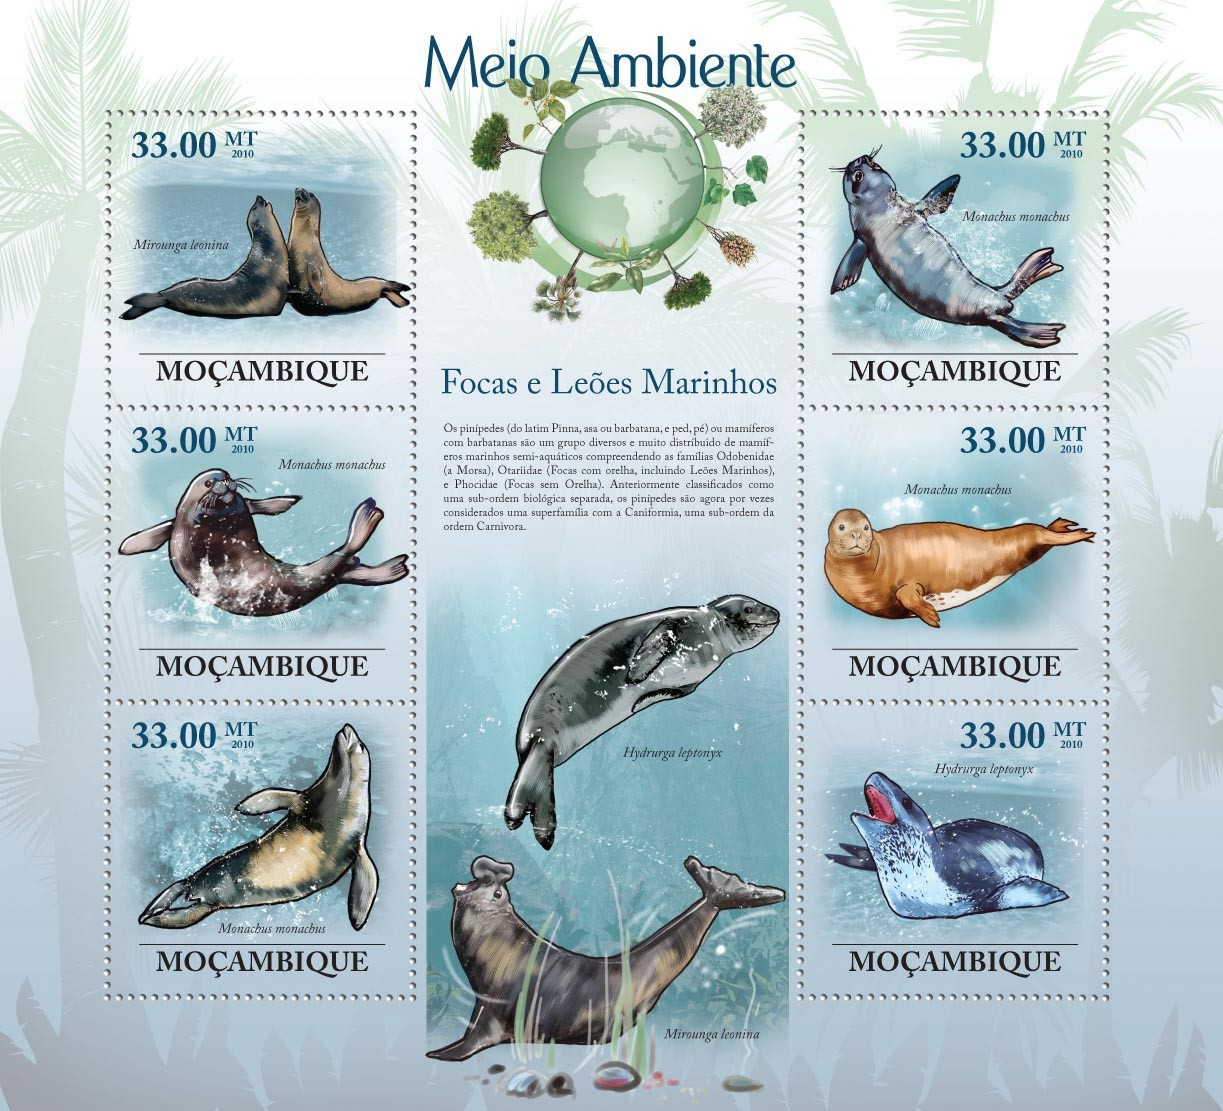 Seals & Sea Lions ( Mirounga leoniva, Monachus monachus, Hydrurga leptonyx ) - Issue of Mozambique postage Stamps